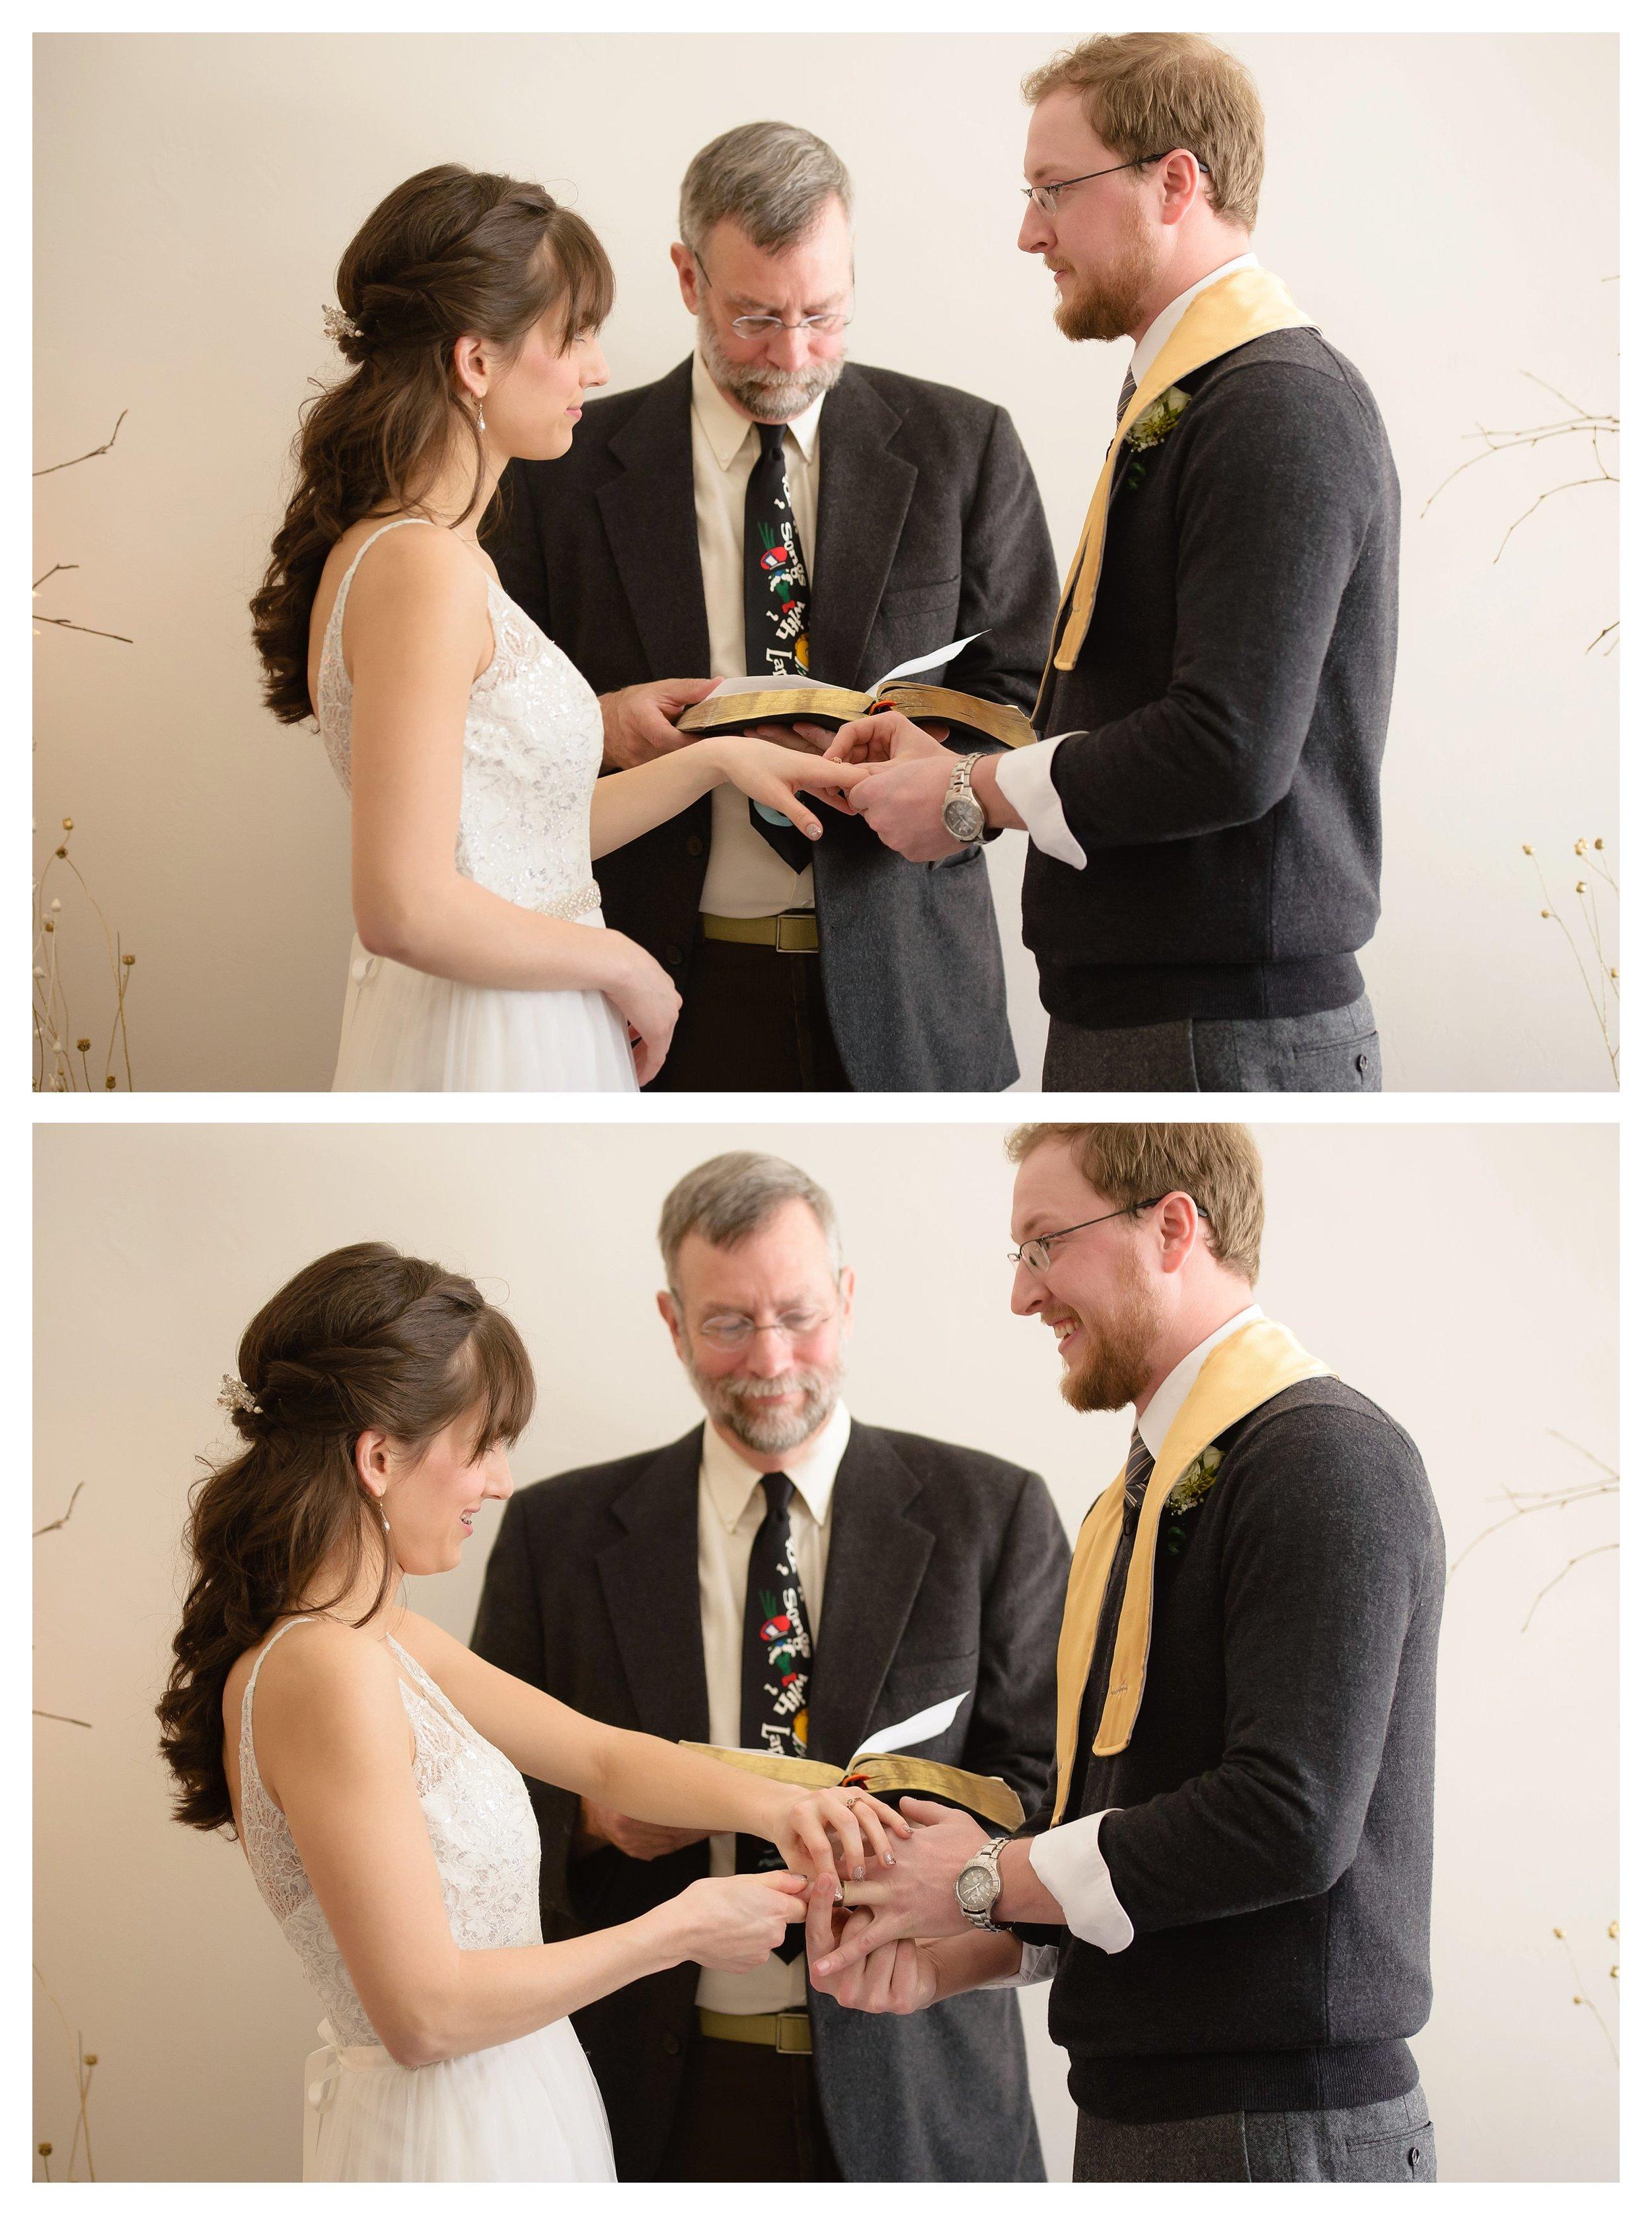 wisconsin wedding photographer timber baron inn bayfield wi ps 139 photography jen jensen_0206.jpg